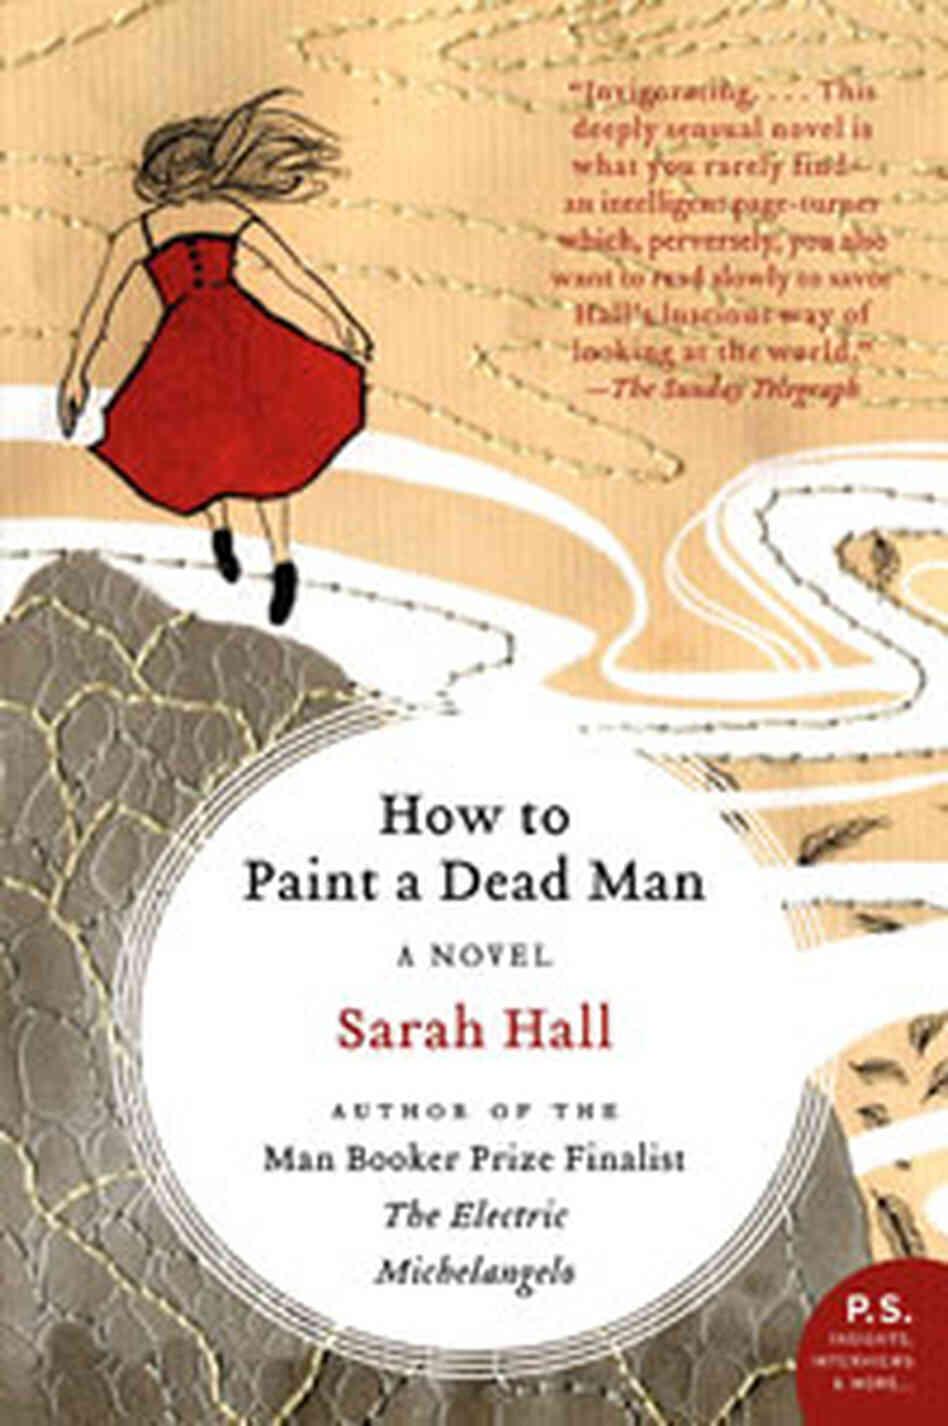 Book Cover Template Paint : Bold novel of art ideas and one dead man npr